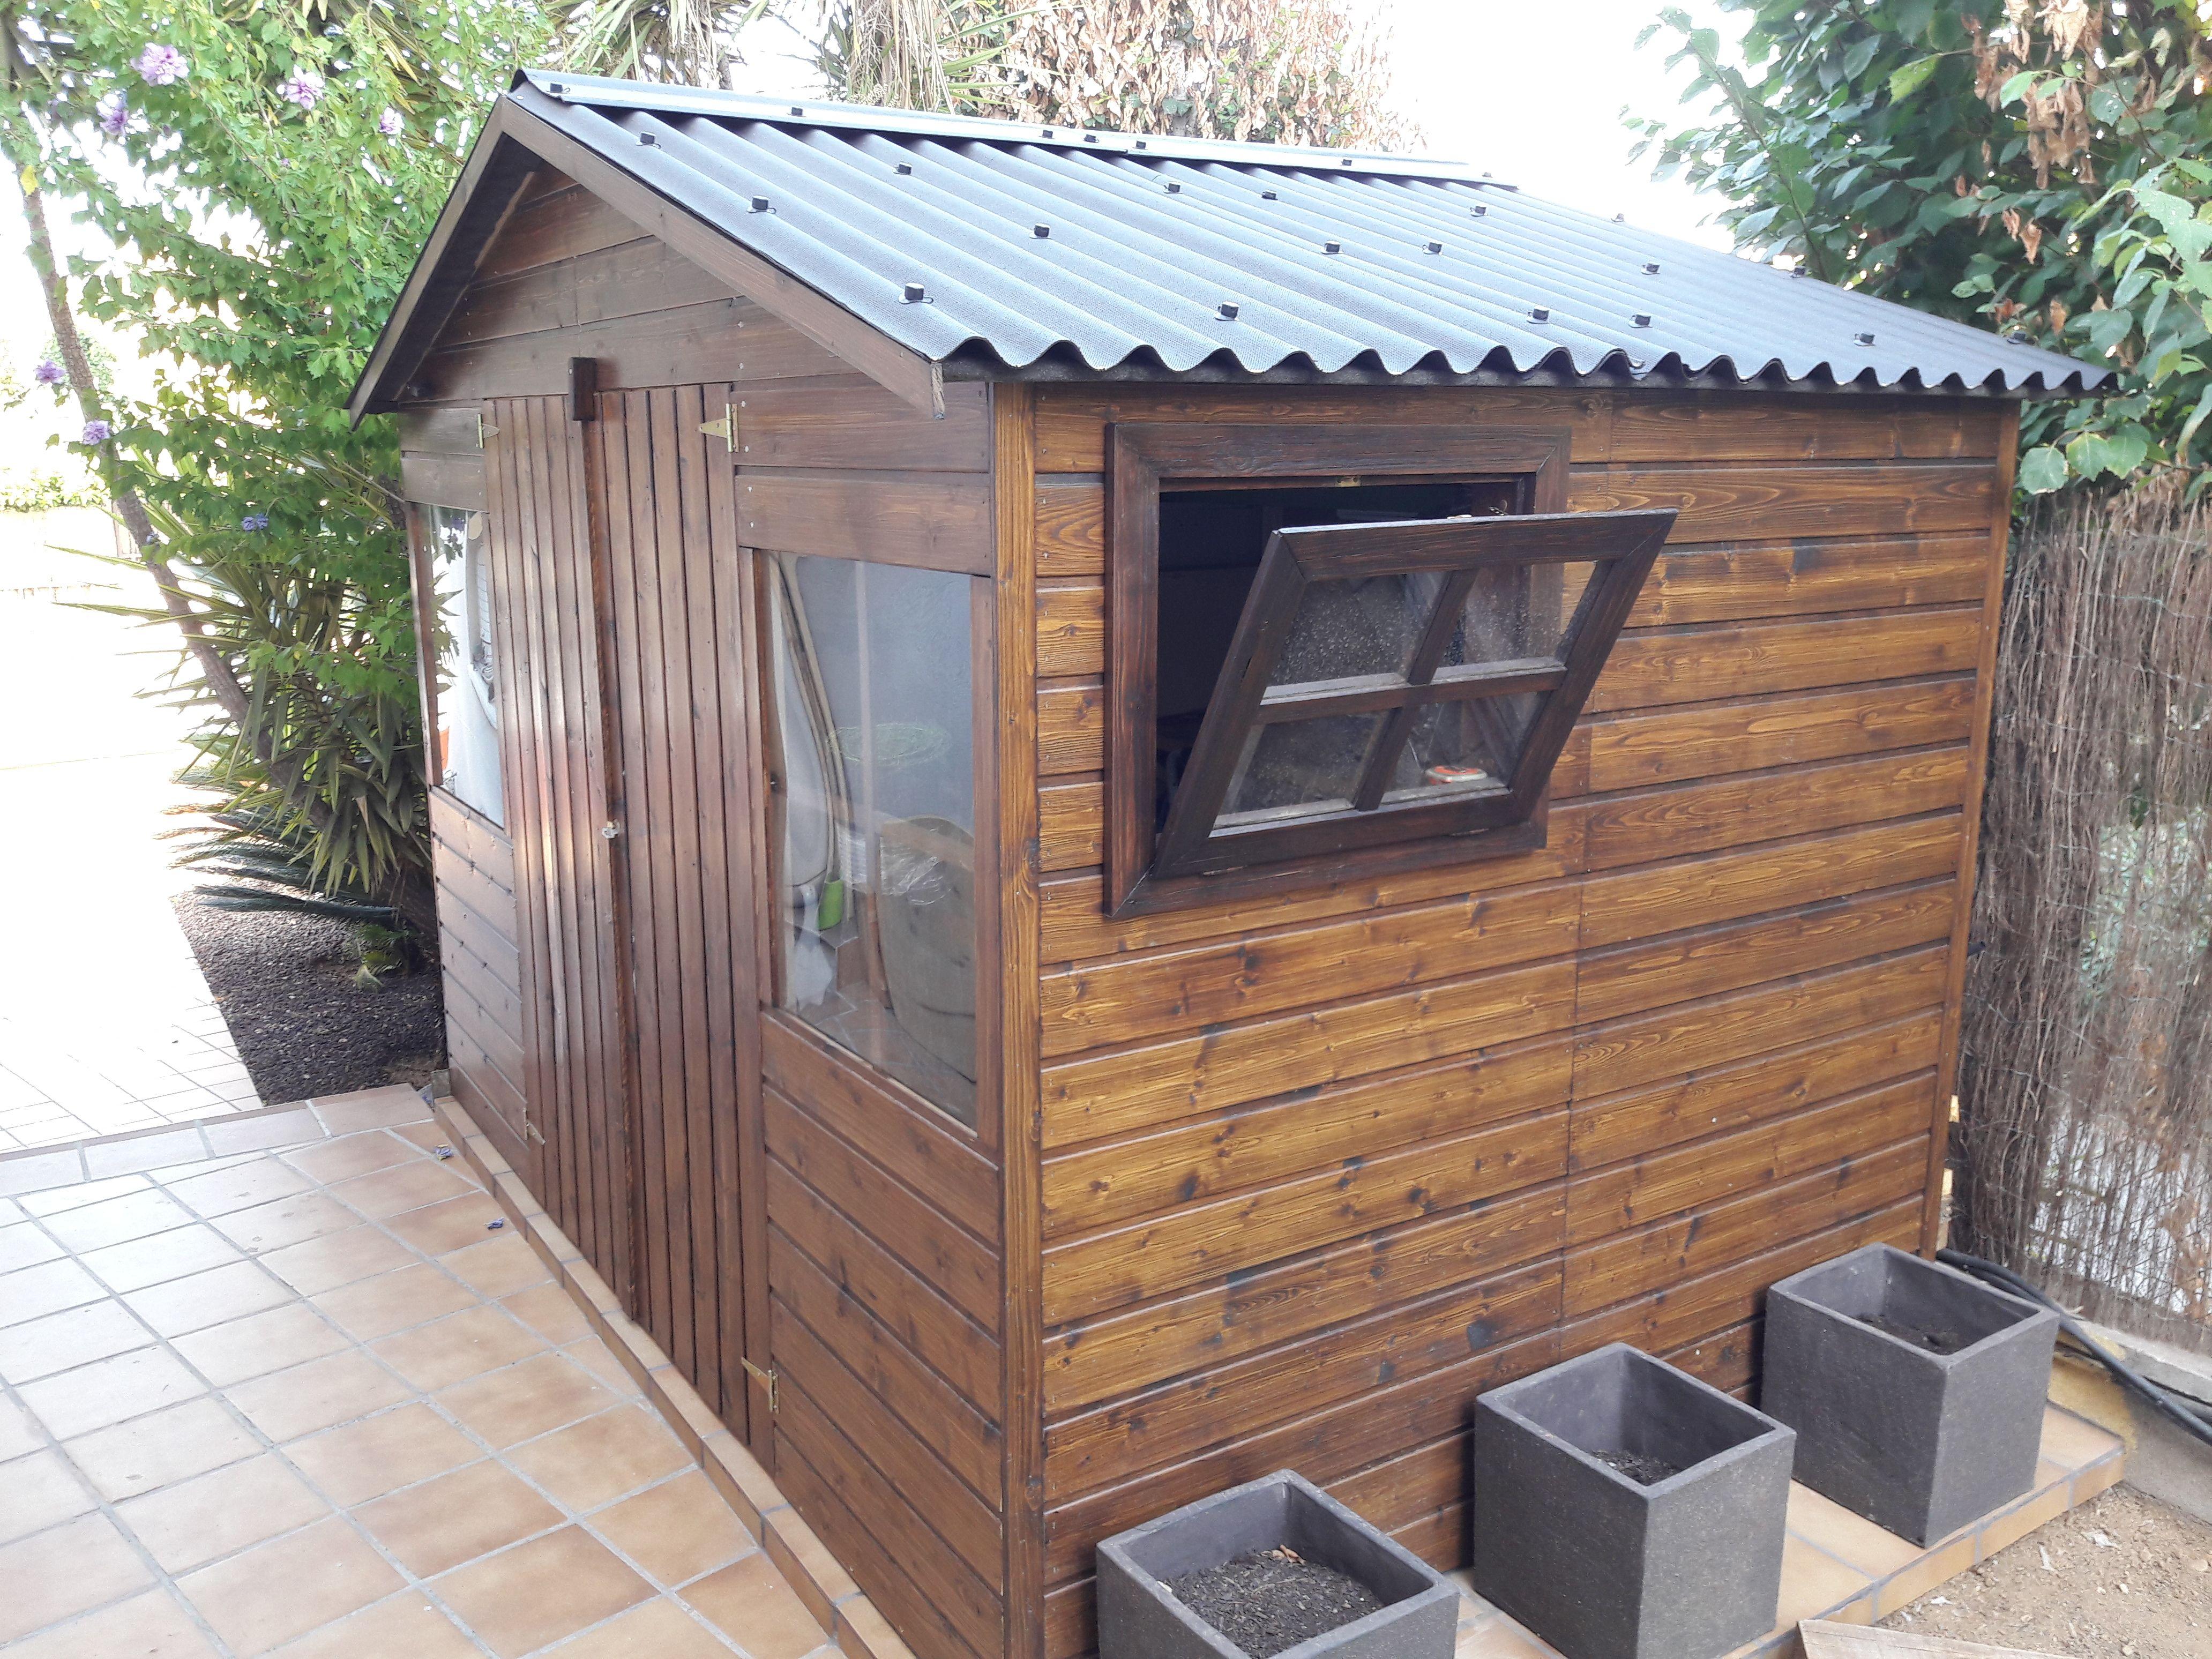 caseta de madera fresno personalizada con techo asf ltico